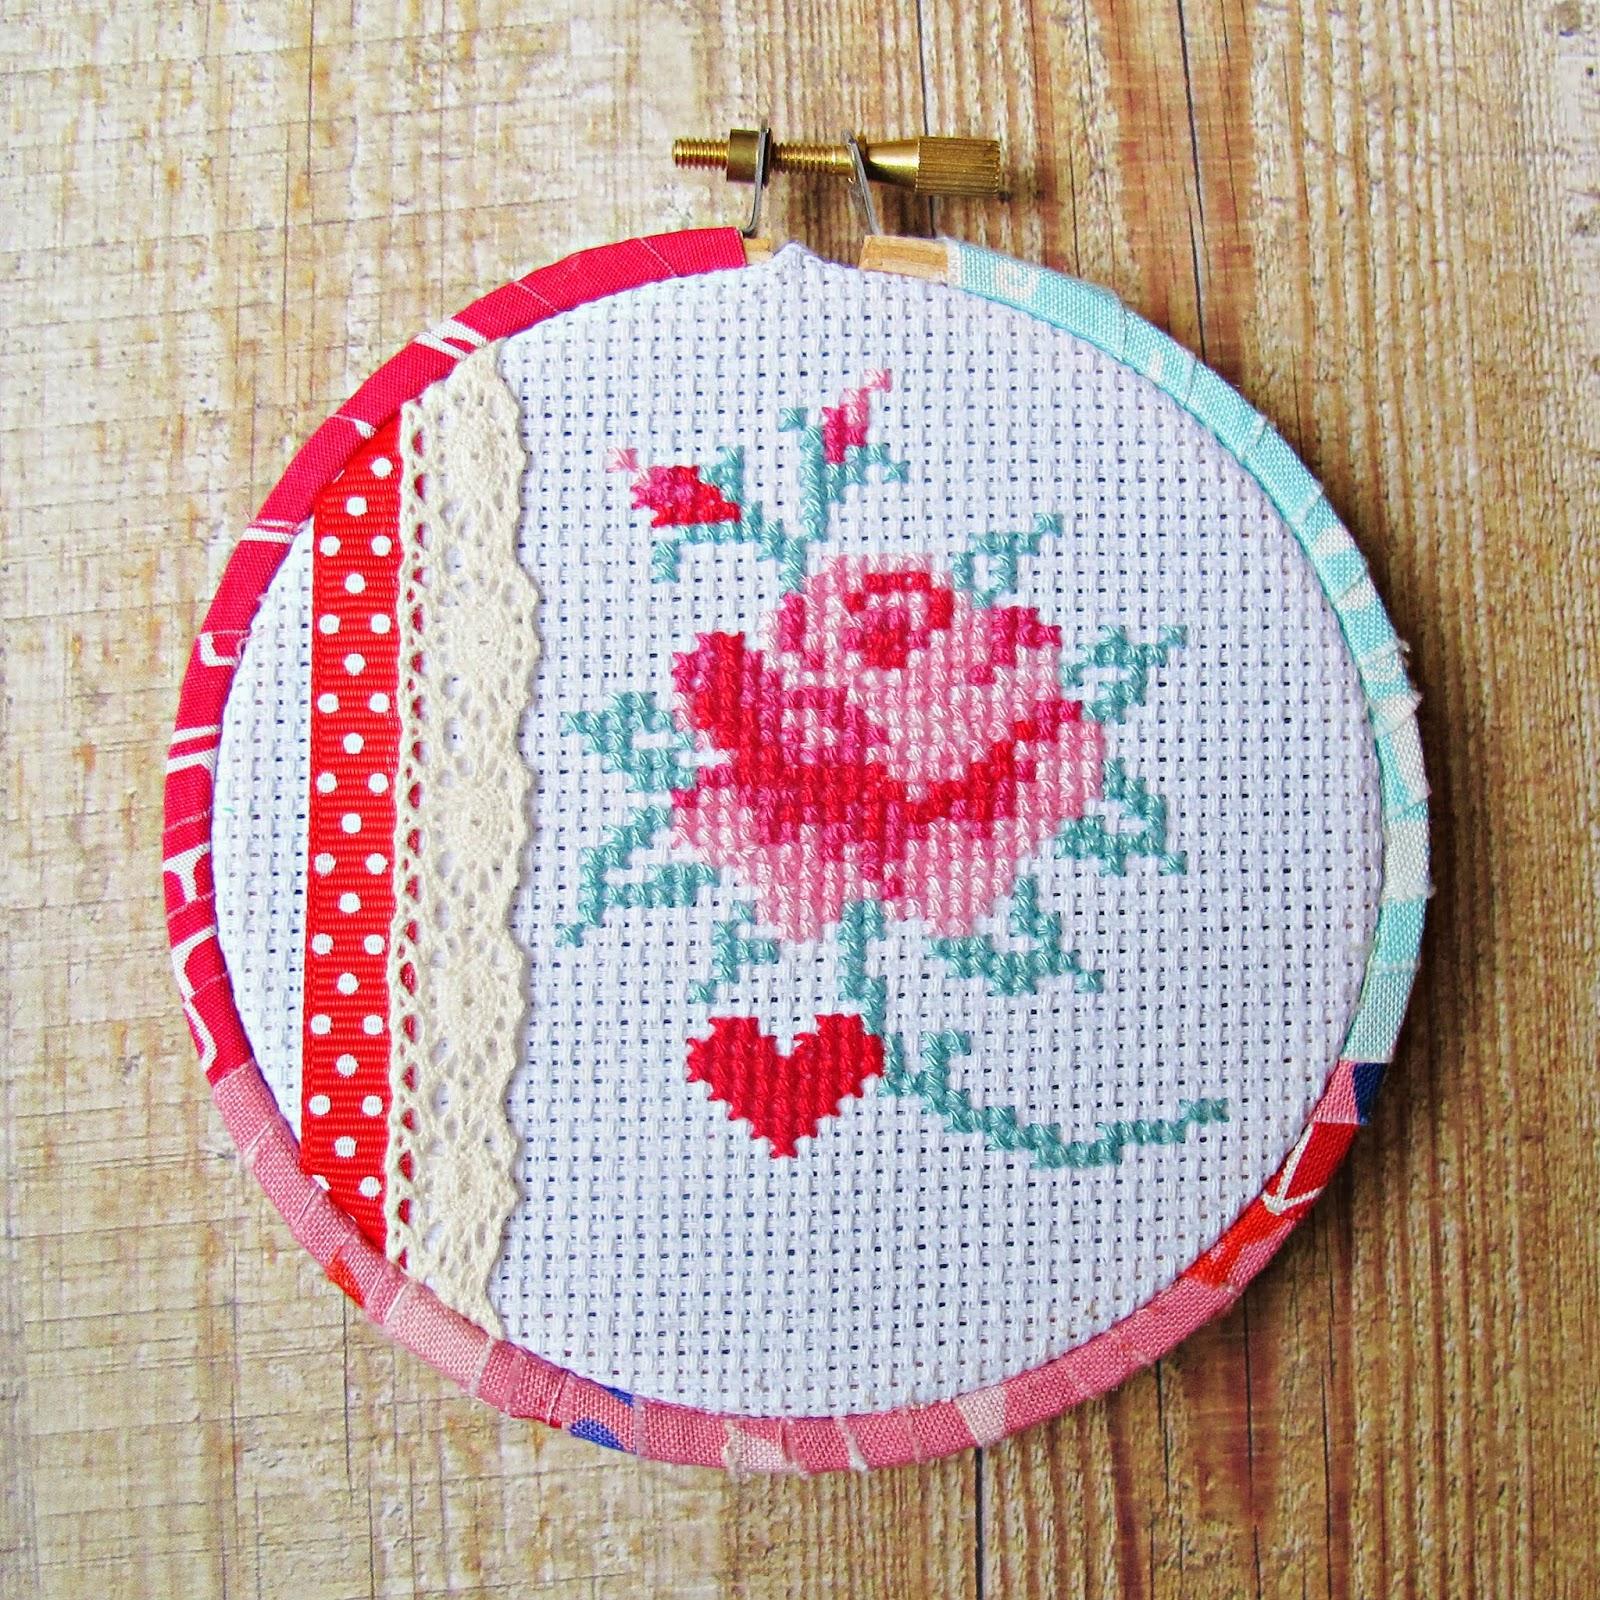 image mollie makes issue 30 cross stitch freebie eline pellinkhof rose shabby chic